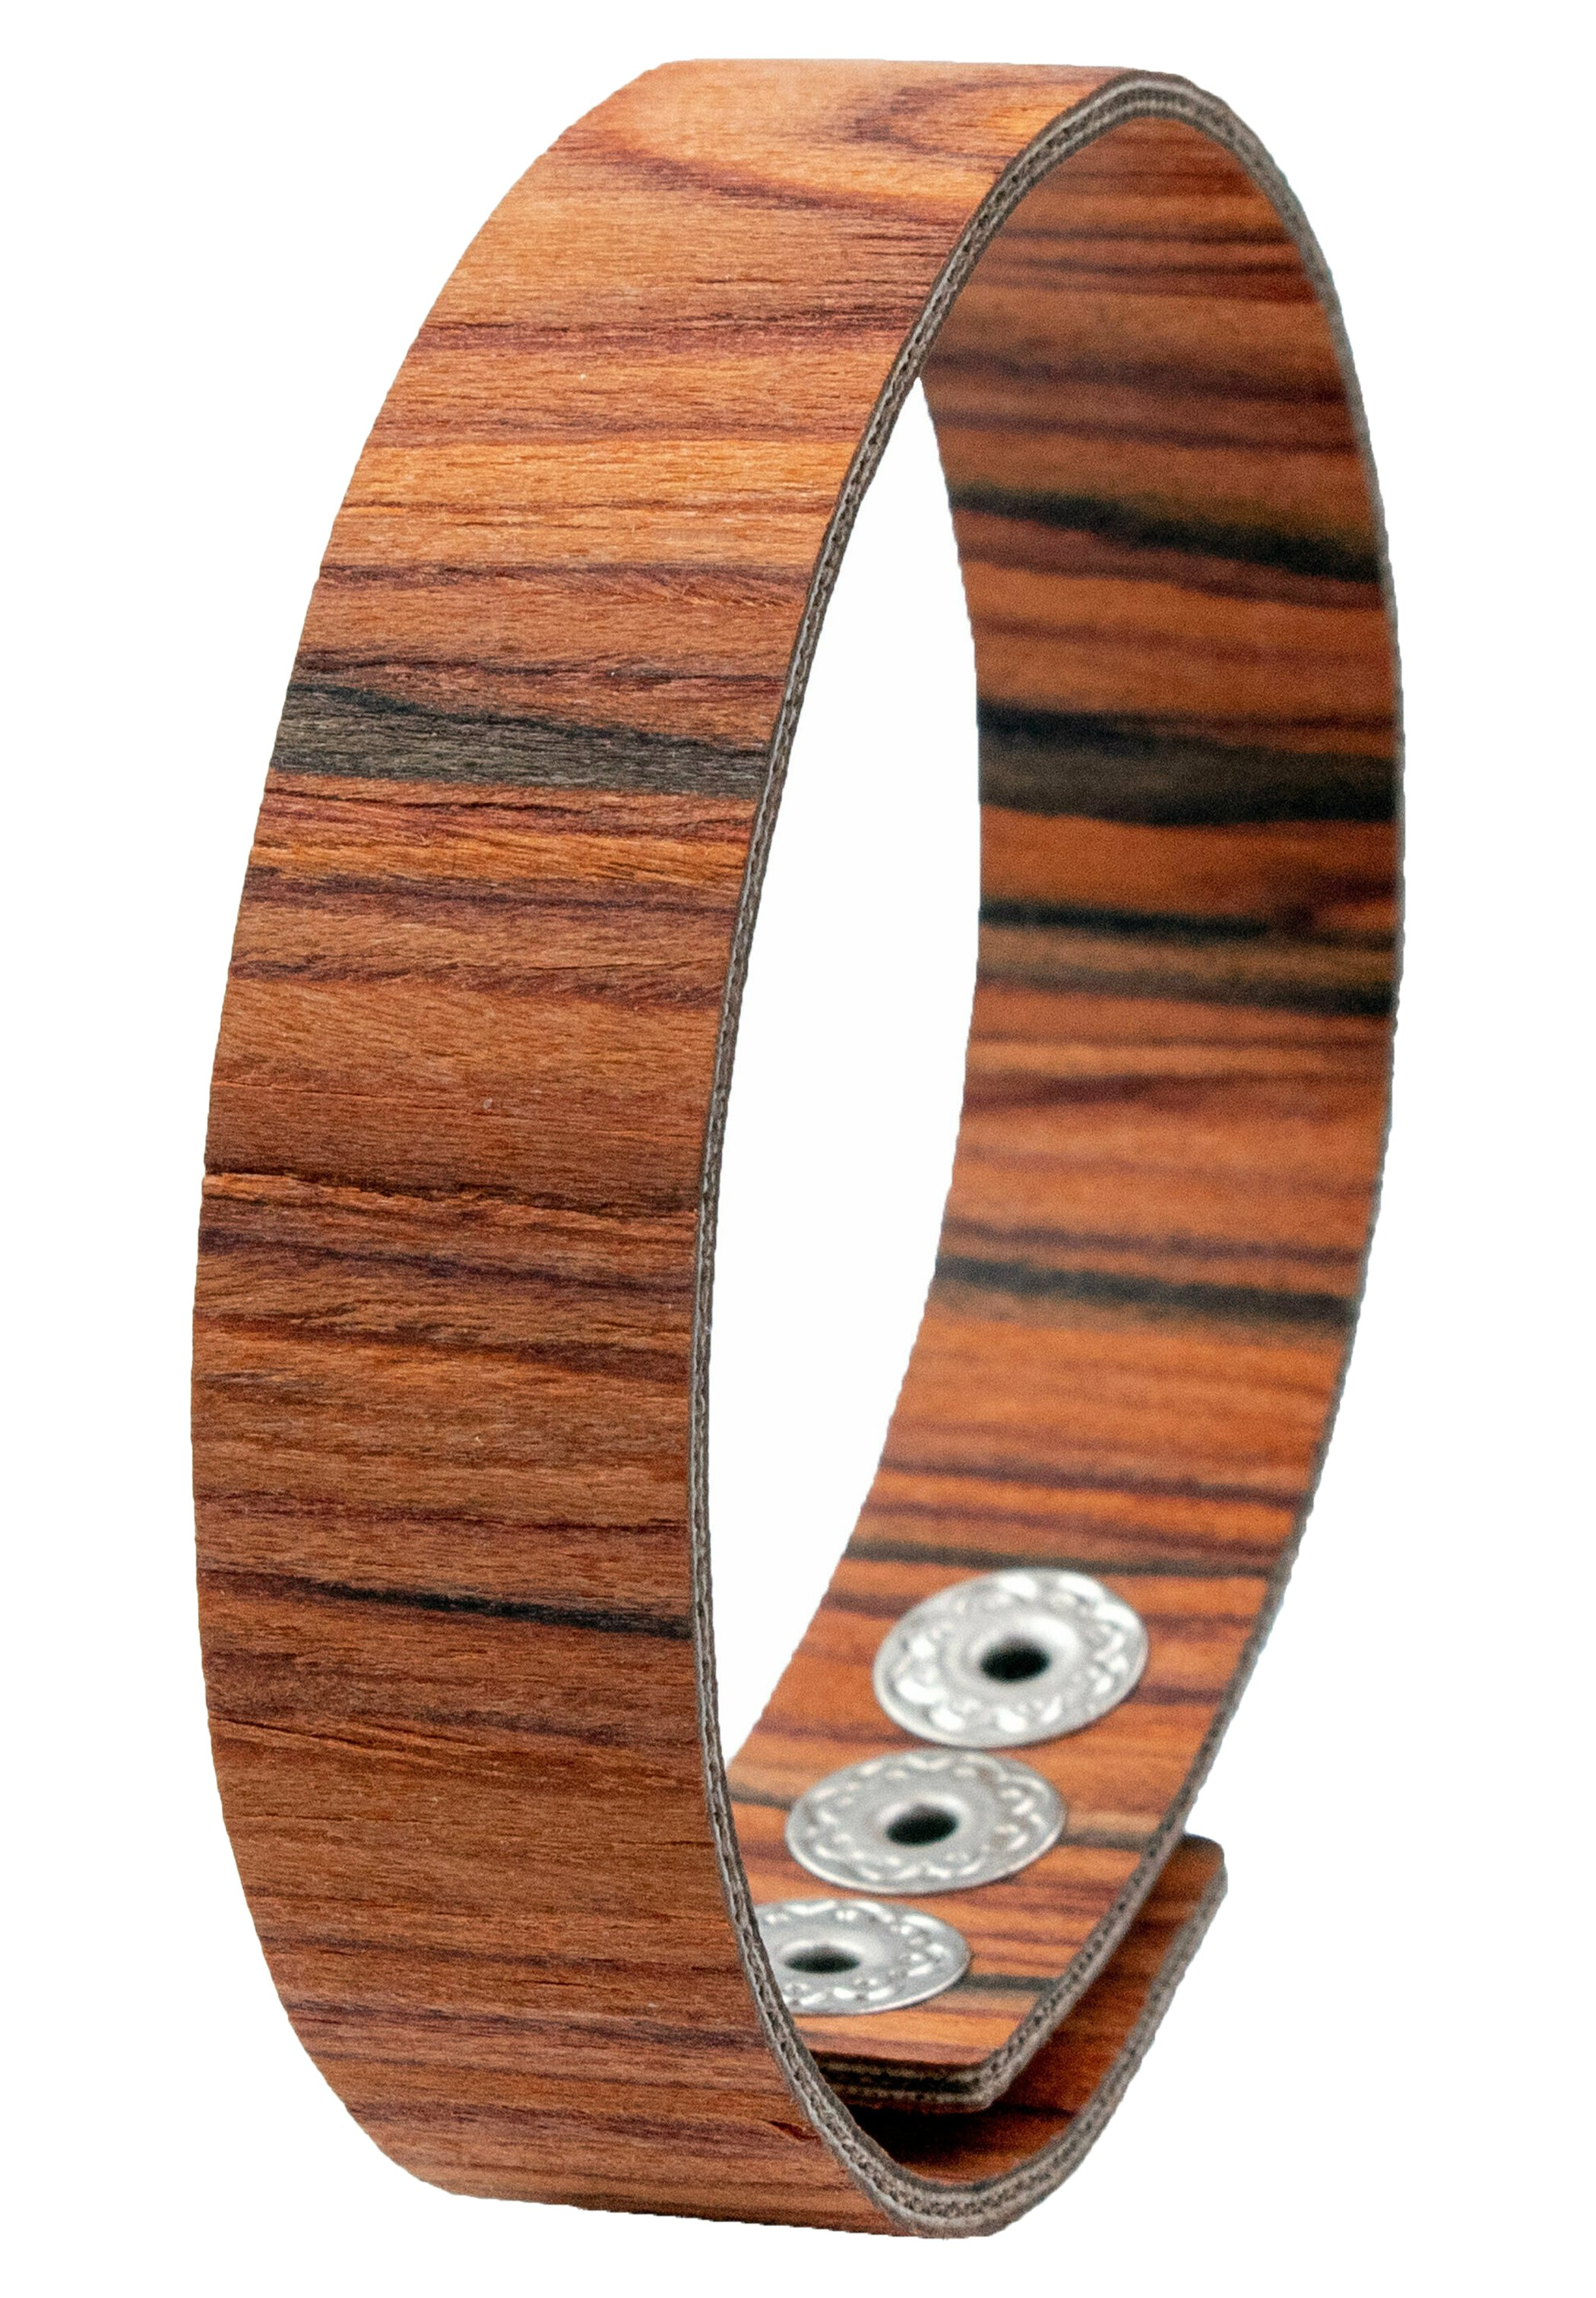 Femme LAIMER WICKEL-ARMBAND AUS ROSENHOLZ - S1116 - Bracelet